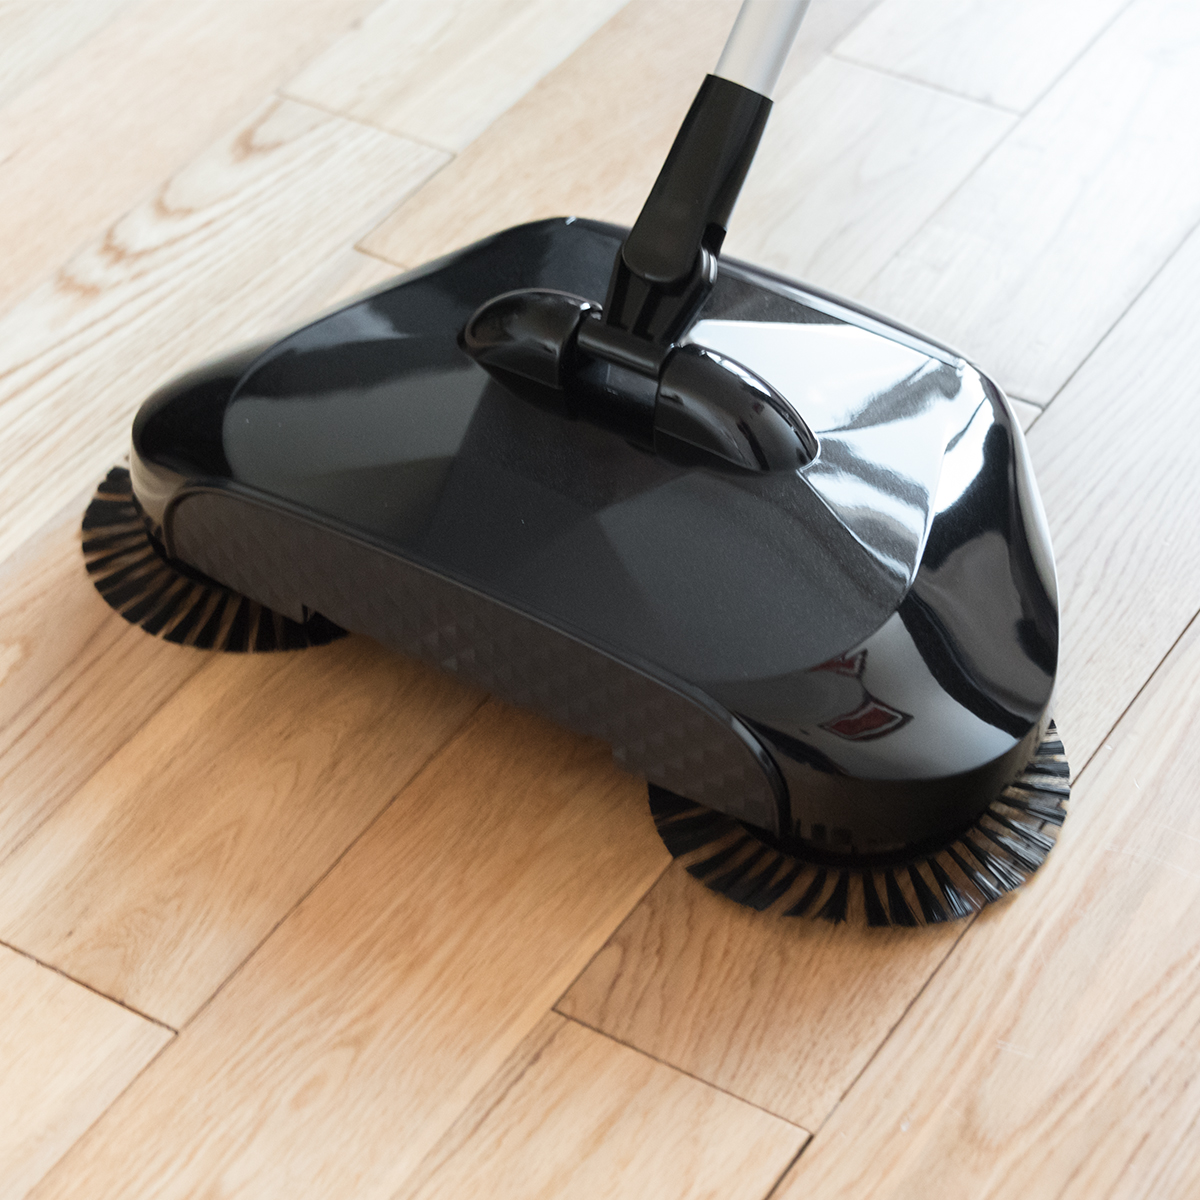 Sentinel Kct Black Hand Push Floor Sweeper Triple Brush Household Automatic Cleaner Broom